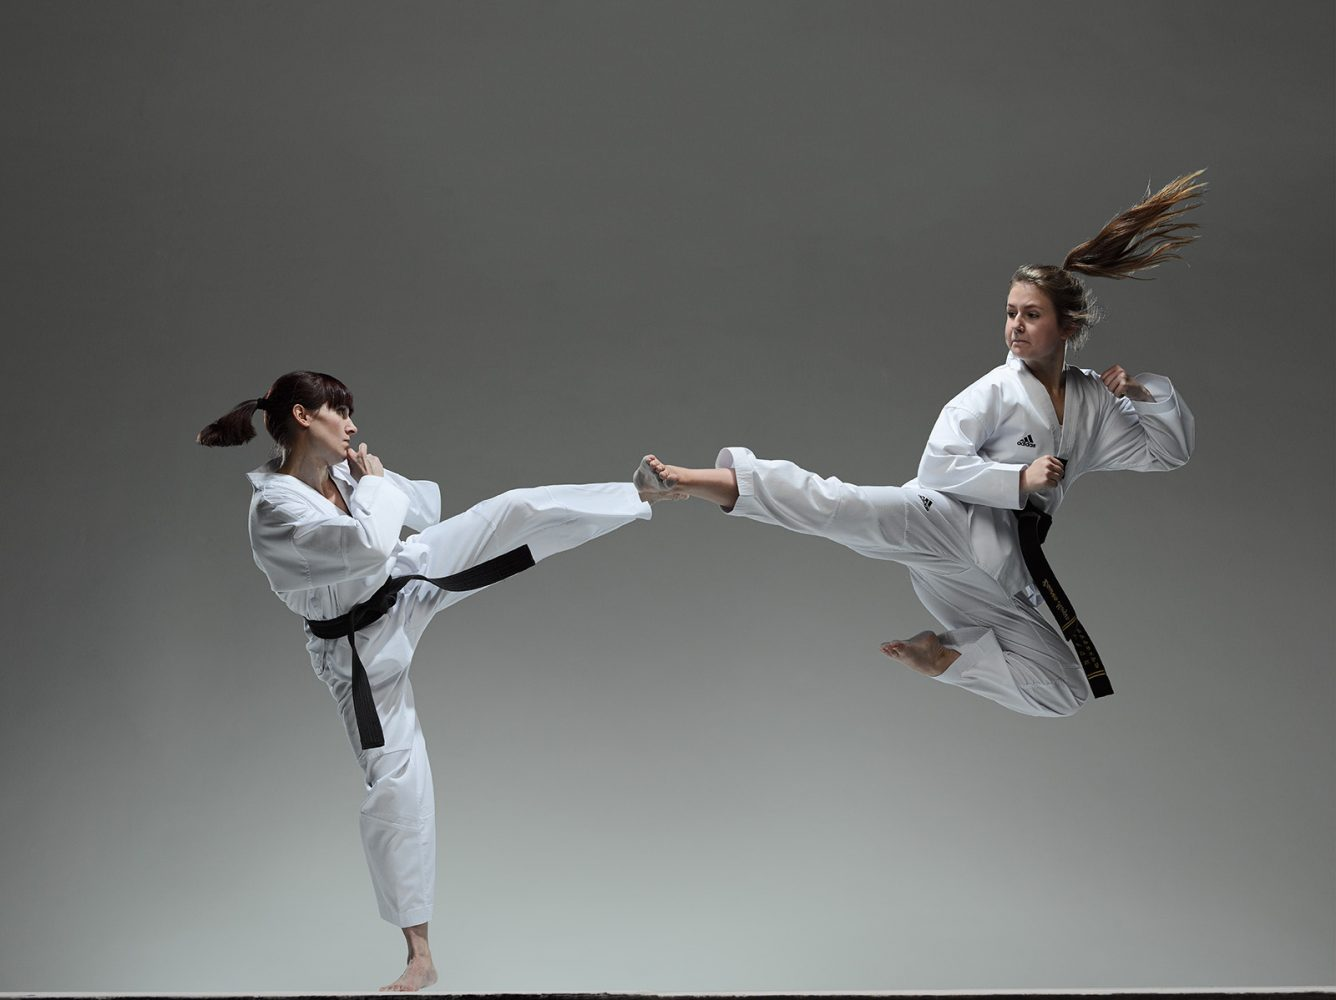 Taekwondo   two girls taekwondo